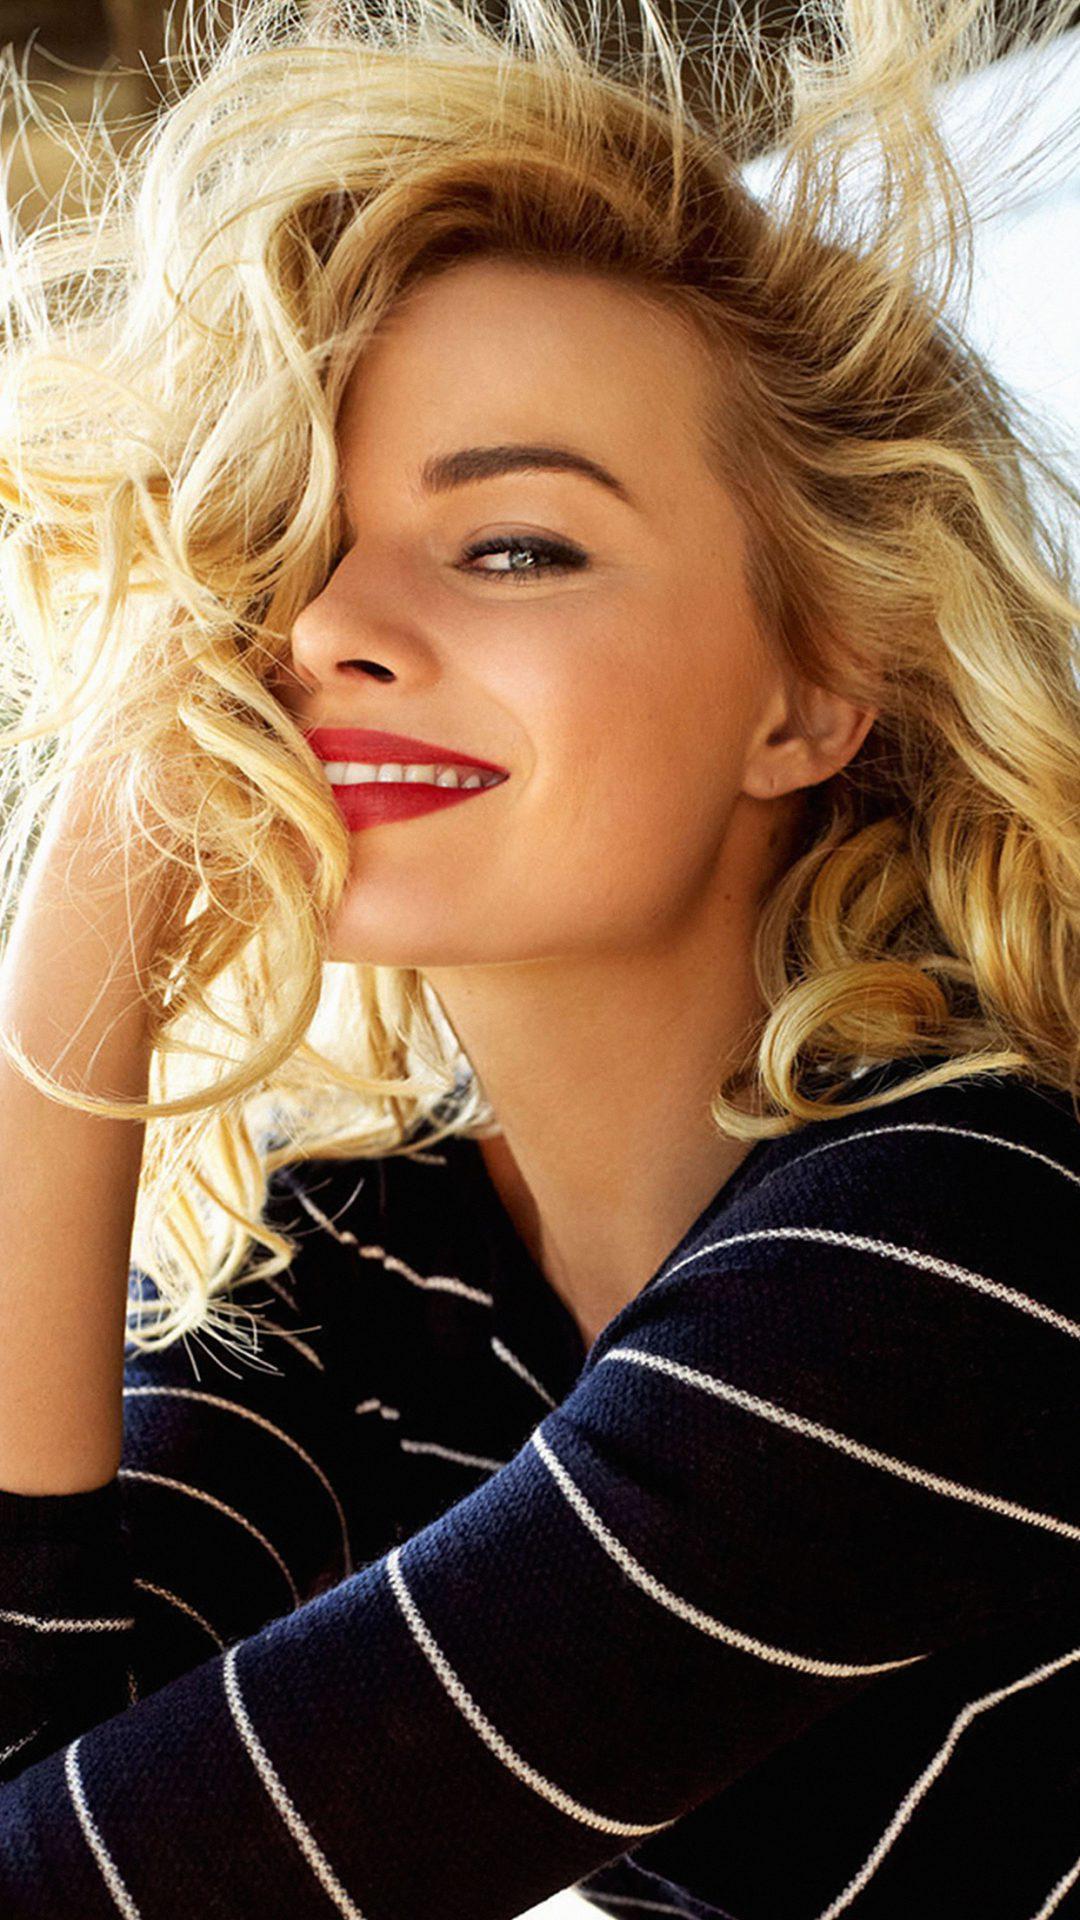 Margot Robbie Smile Celebrity Photo